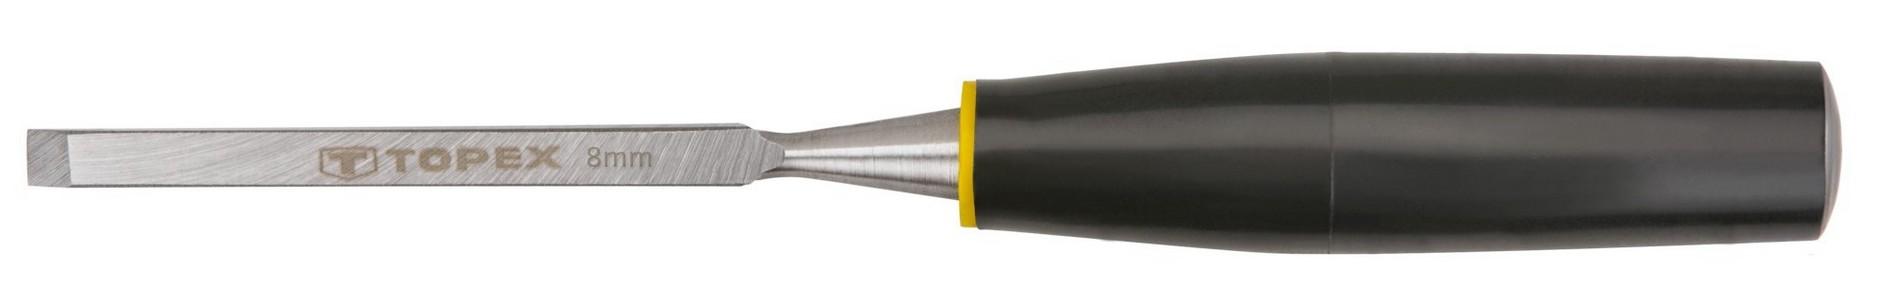 Favésõ 8 mm lapos, mûanyag nyelû | TOPEX 09A108